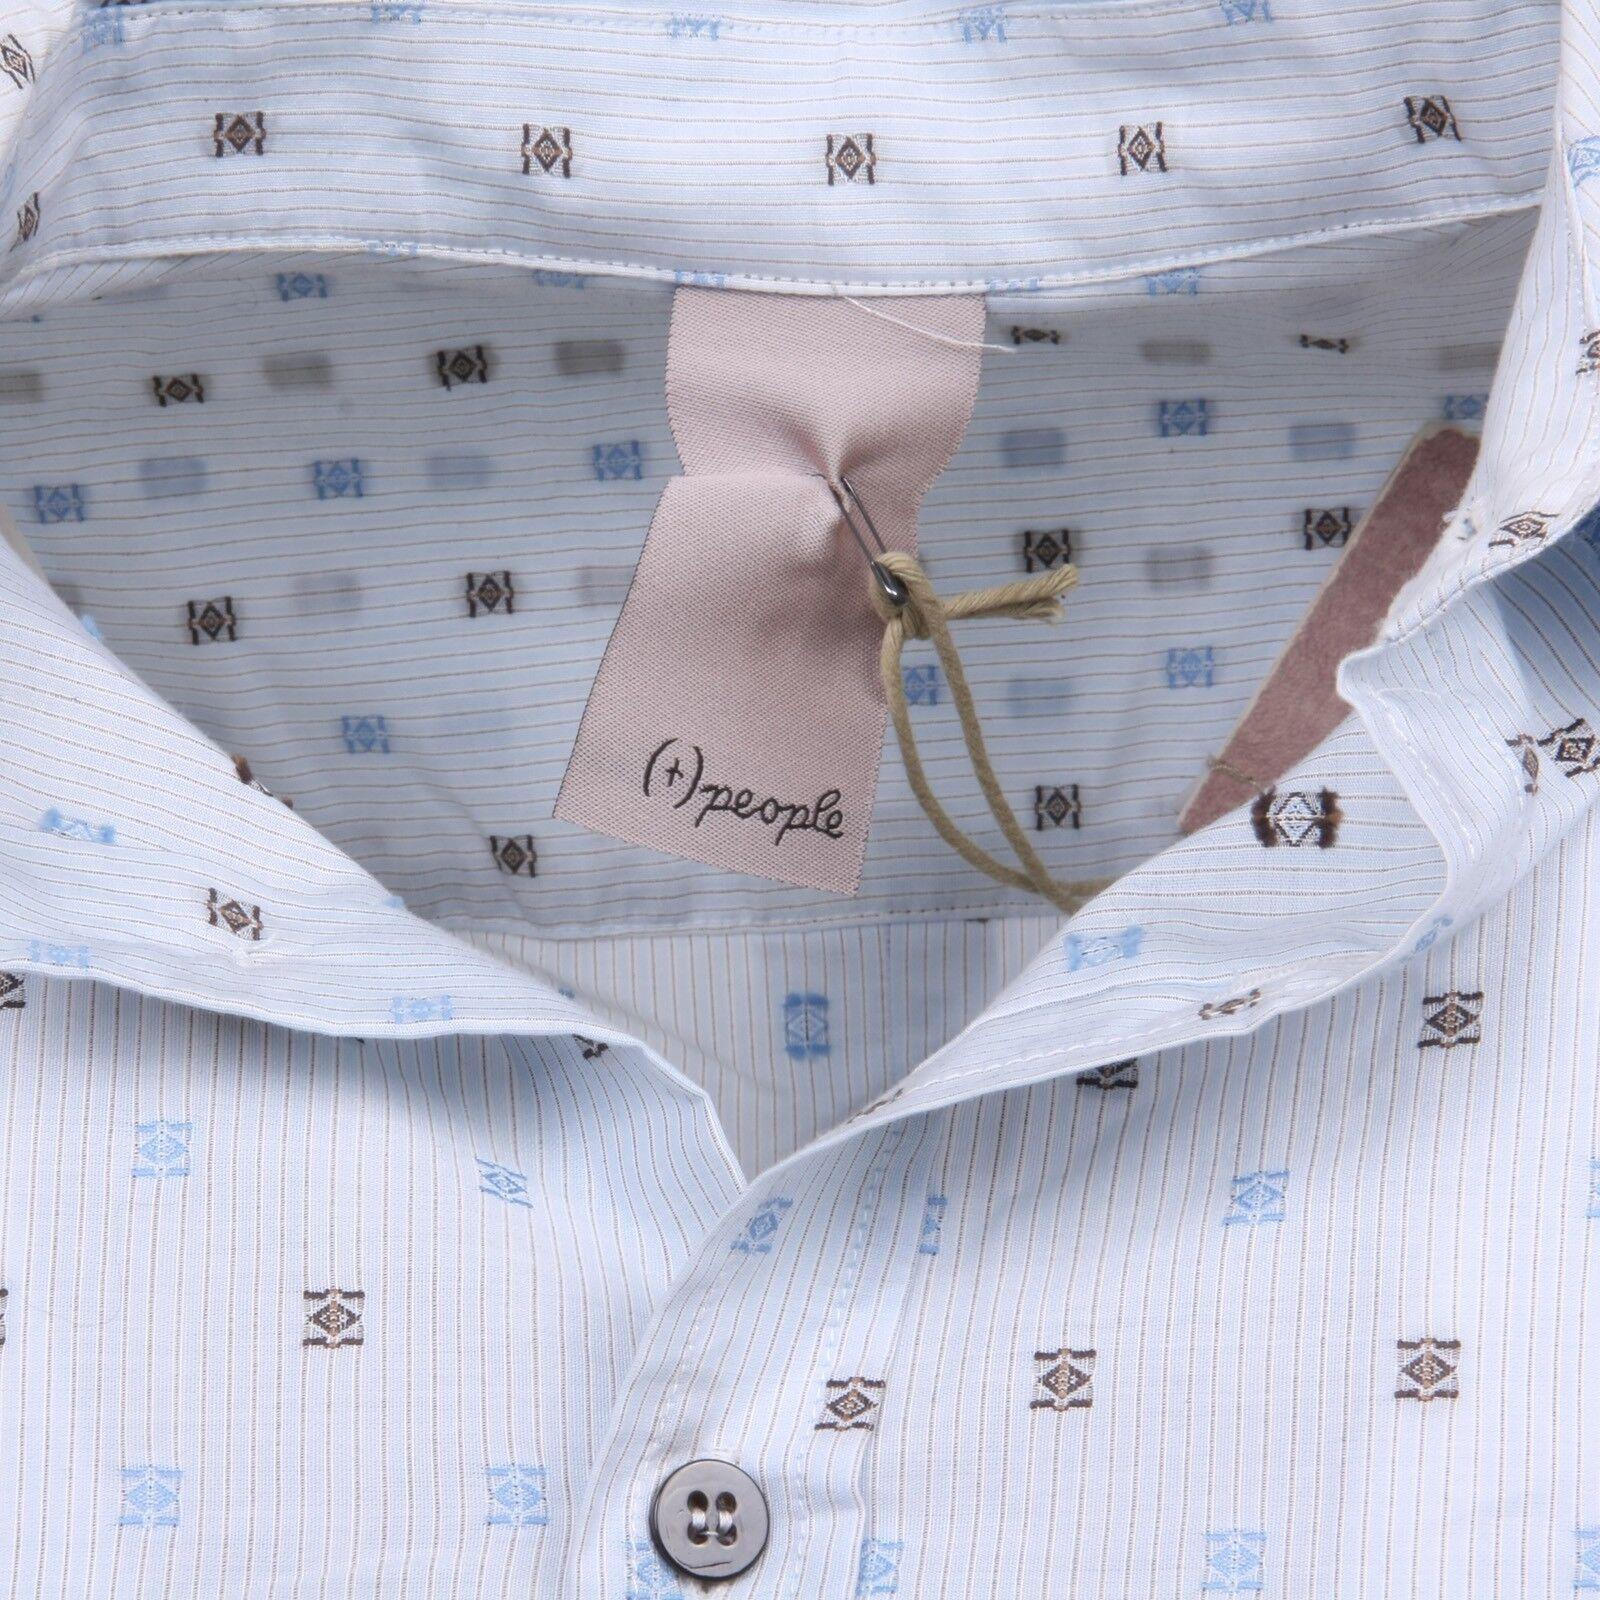 C0880 camicia uomo (+) PEOPLE TIZIANA azzurro manica manica manica lunga shirt men 639eee